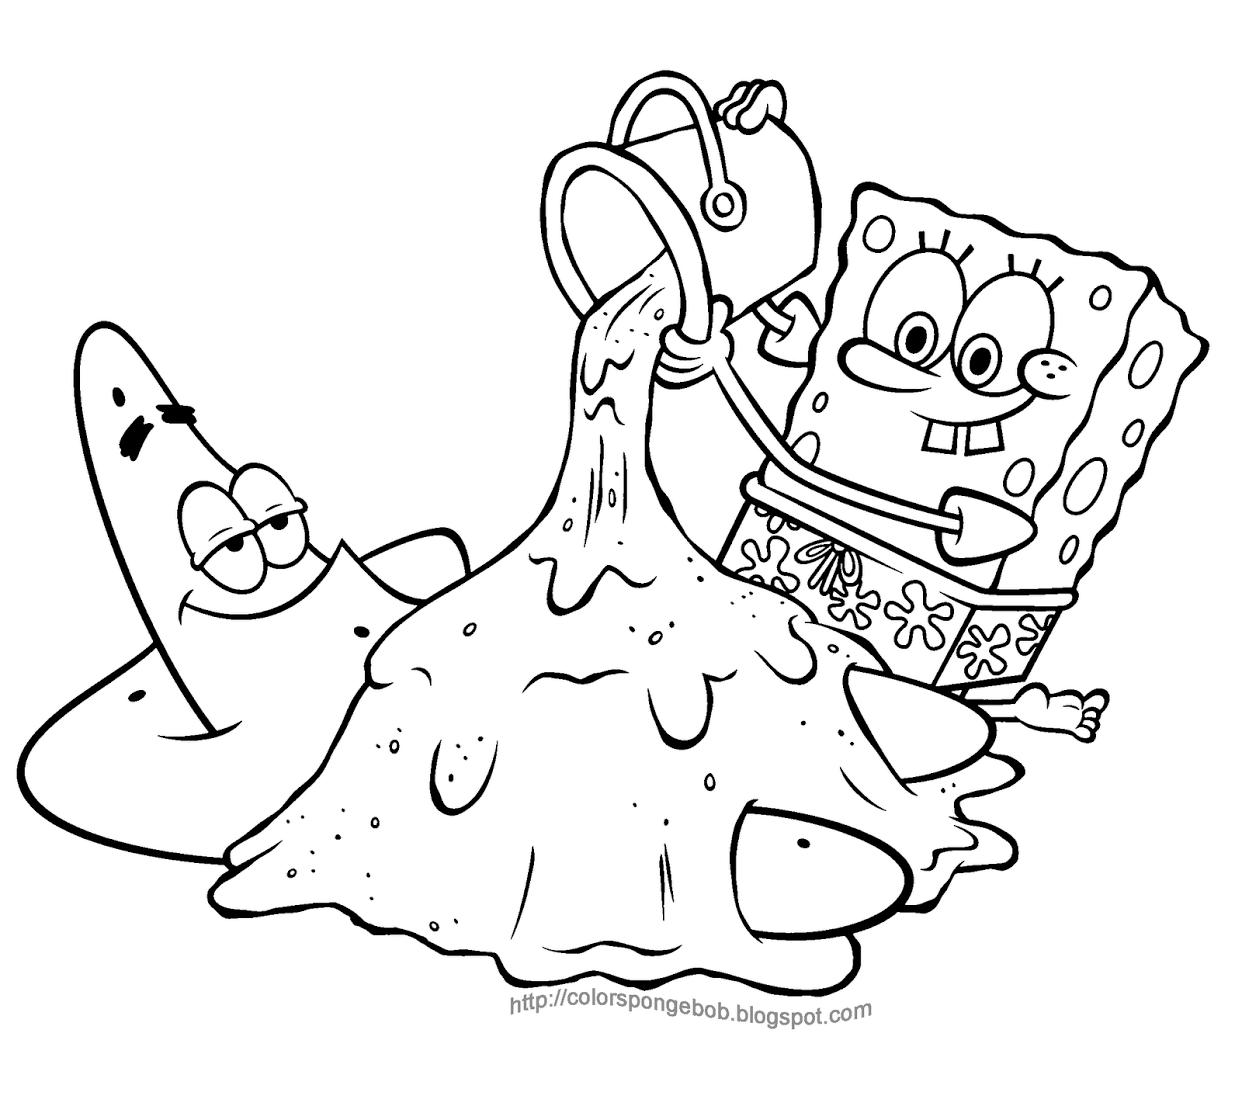 Spongebob Printable Coloring Pages Printable Spongebob